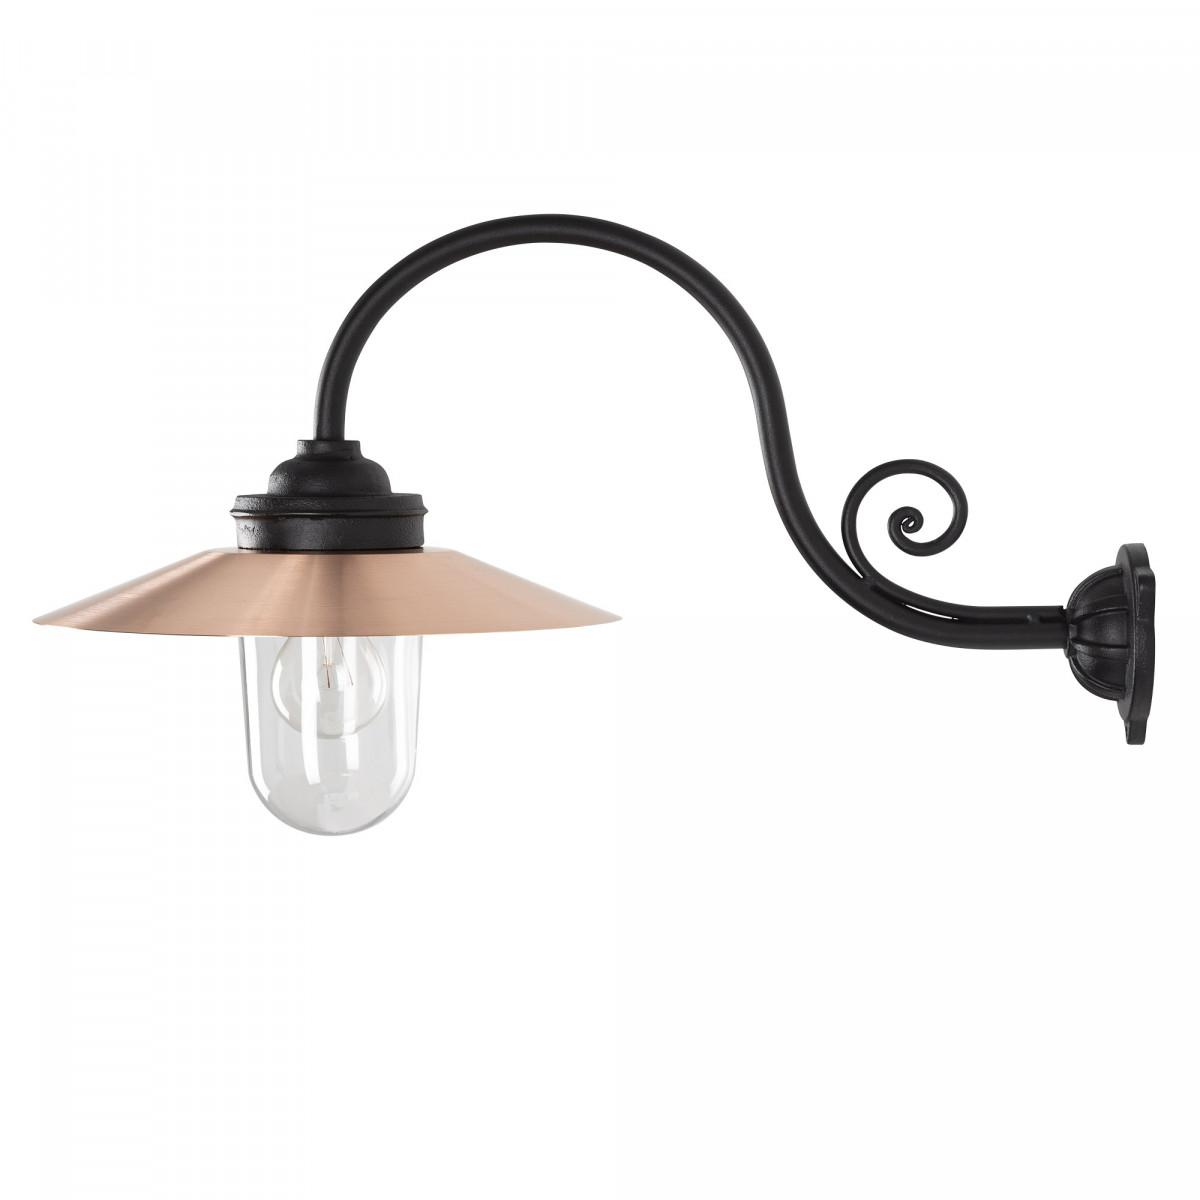 Hoflampe Rhone Schwarz & Kupfer